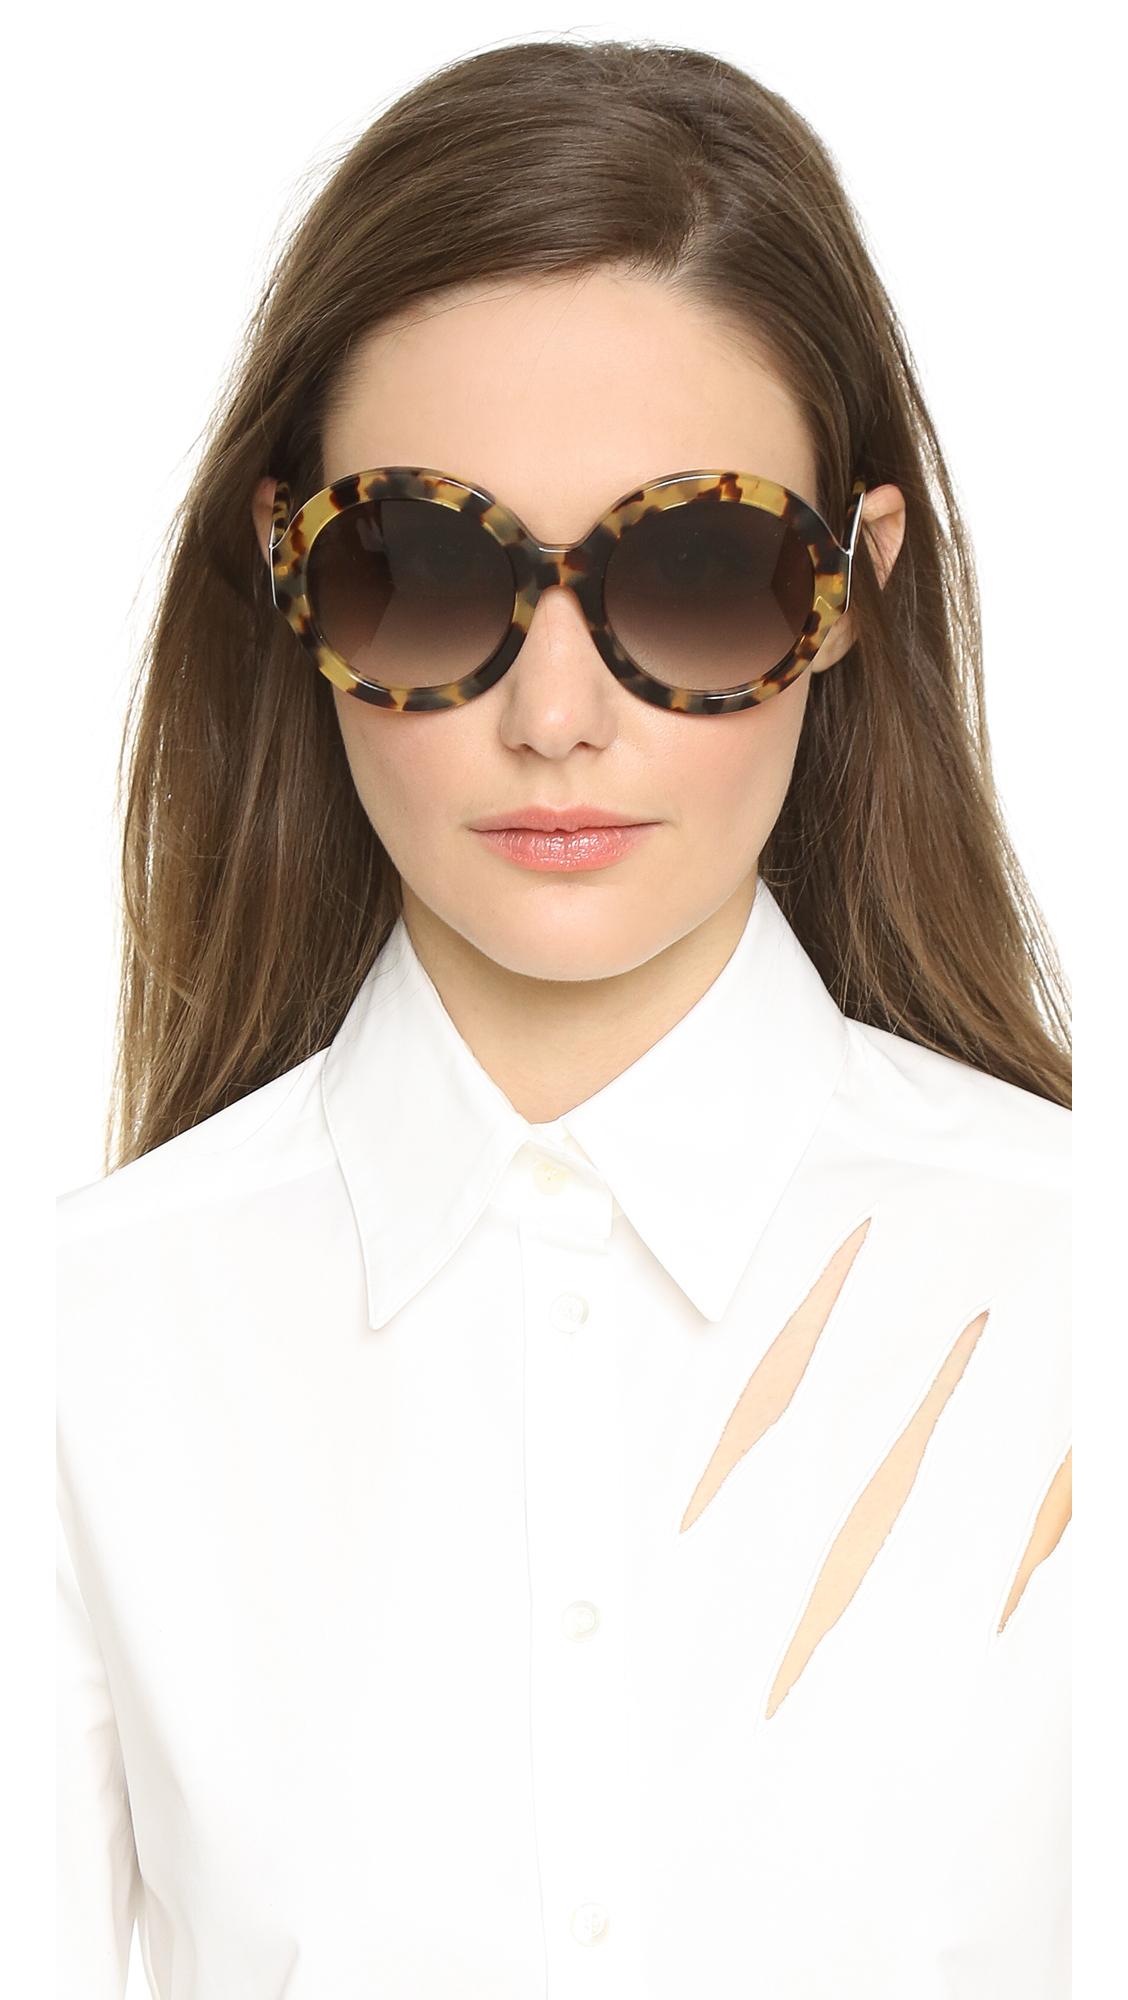 861358270d60 Prada Rounded Sunglasses - Medium Havana/Grey Gradient in Gray - Lyst